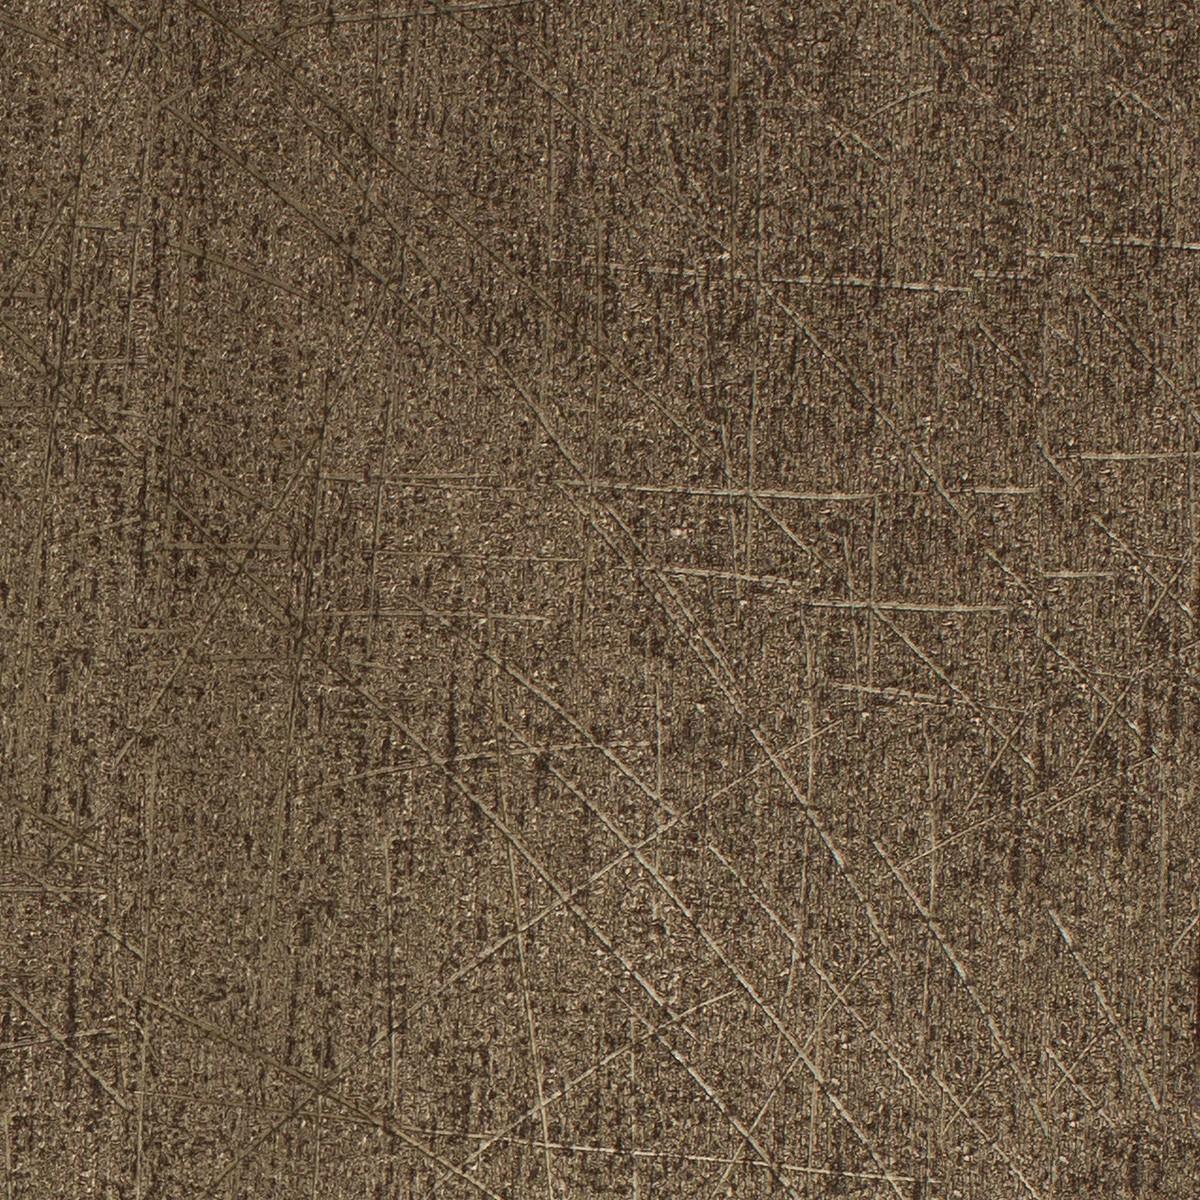 vliestapete luigi colani visions marburg tapete 53301. Black Bedroom Furniture Sets. Home Design Ideas